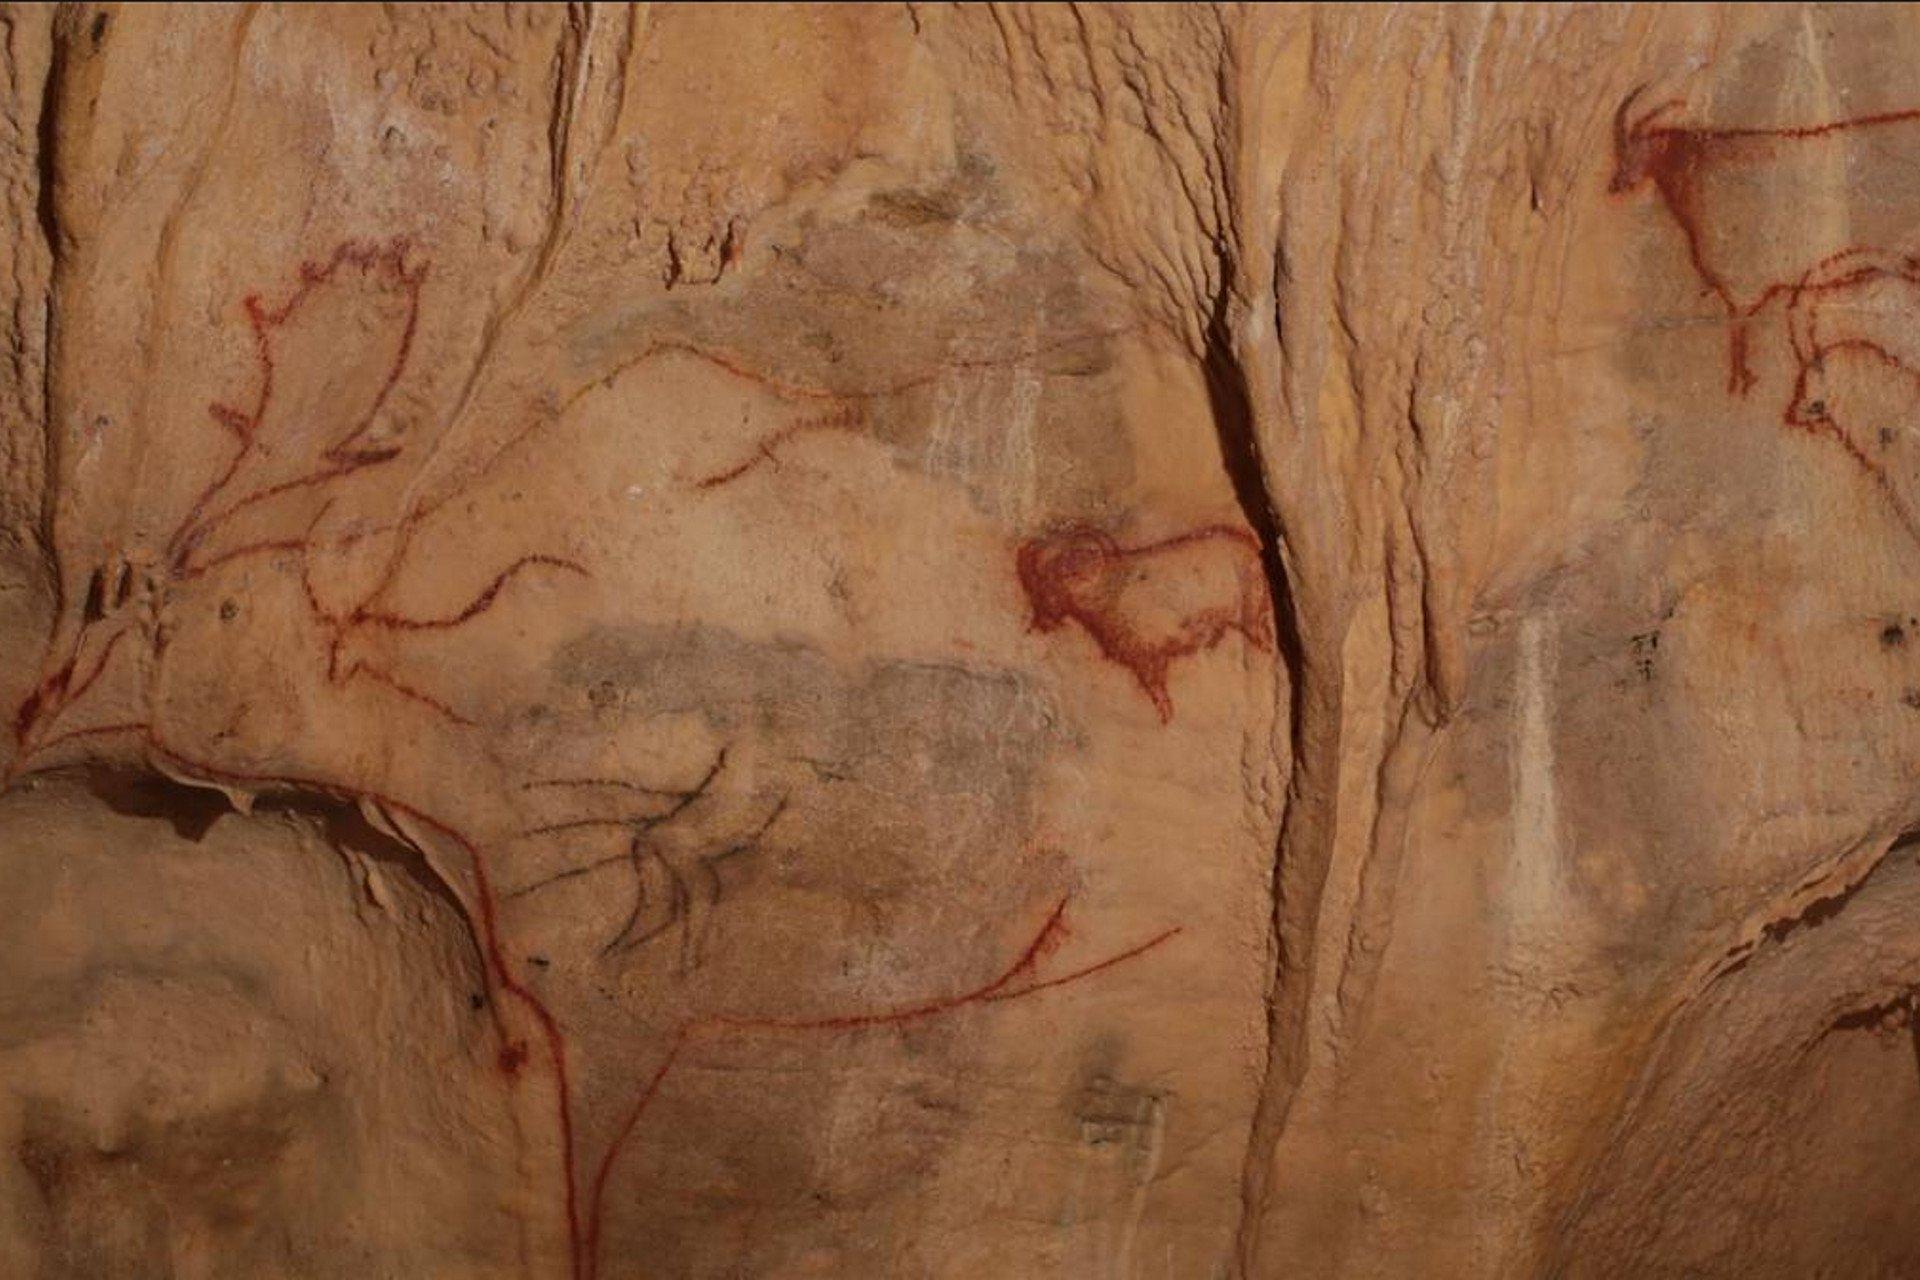 visite privée-grotte-Perigord-Dordogne-Vezere-Cougnac-Sarlat-France